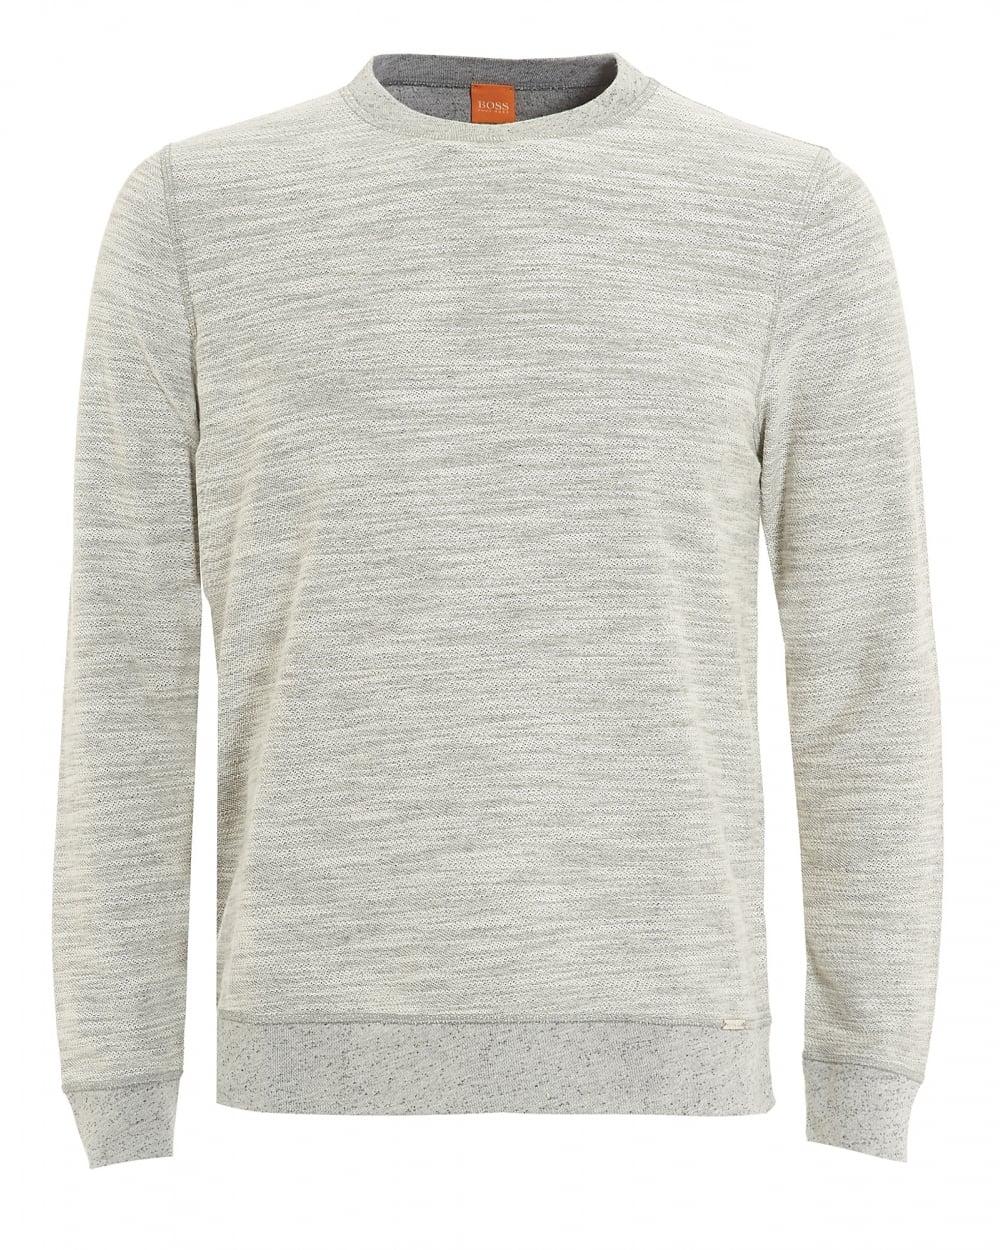 hugo boss grey sweatshirt sale   OFF32% Discounts 71c41ed251